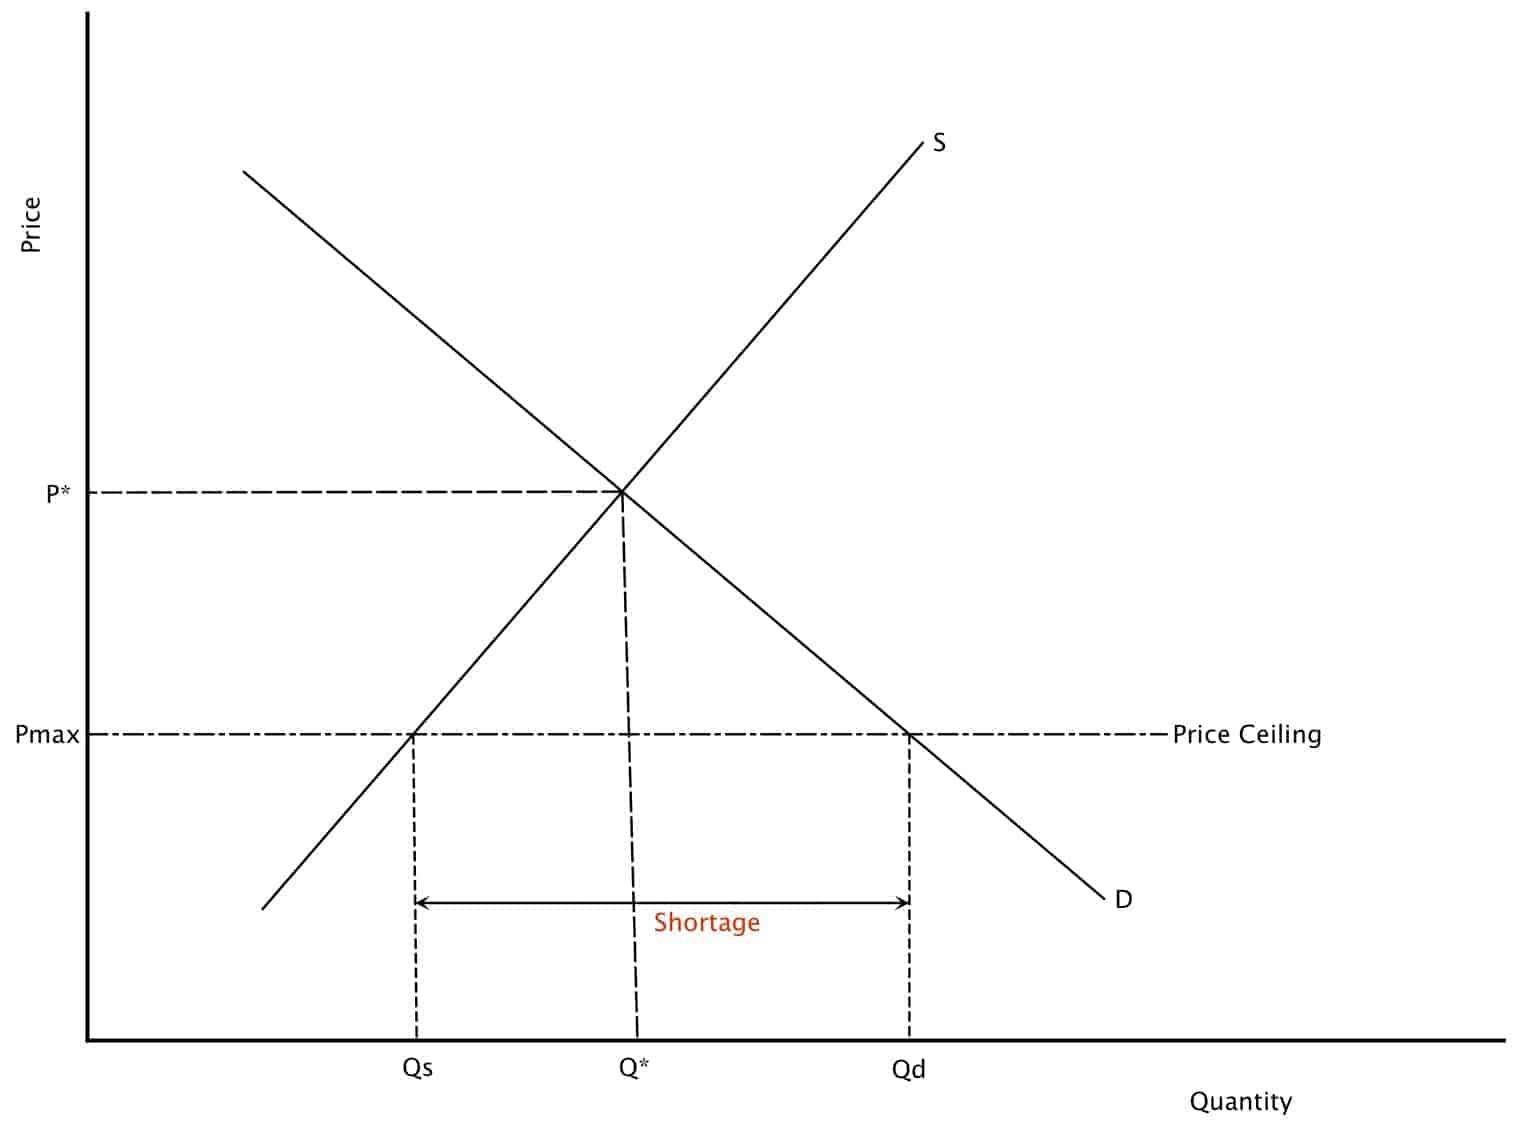 Price Control - Price Ceiling | Intelligent Economist